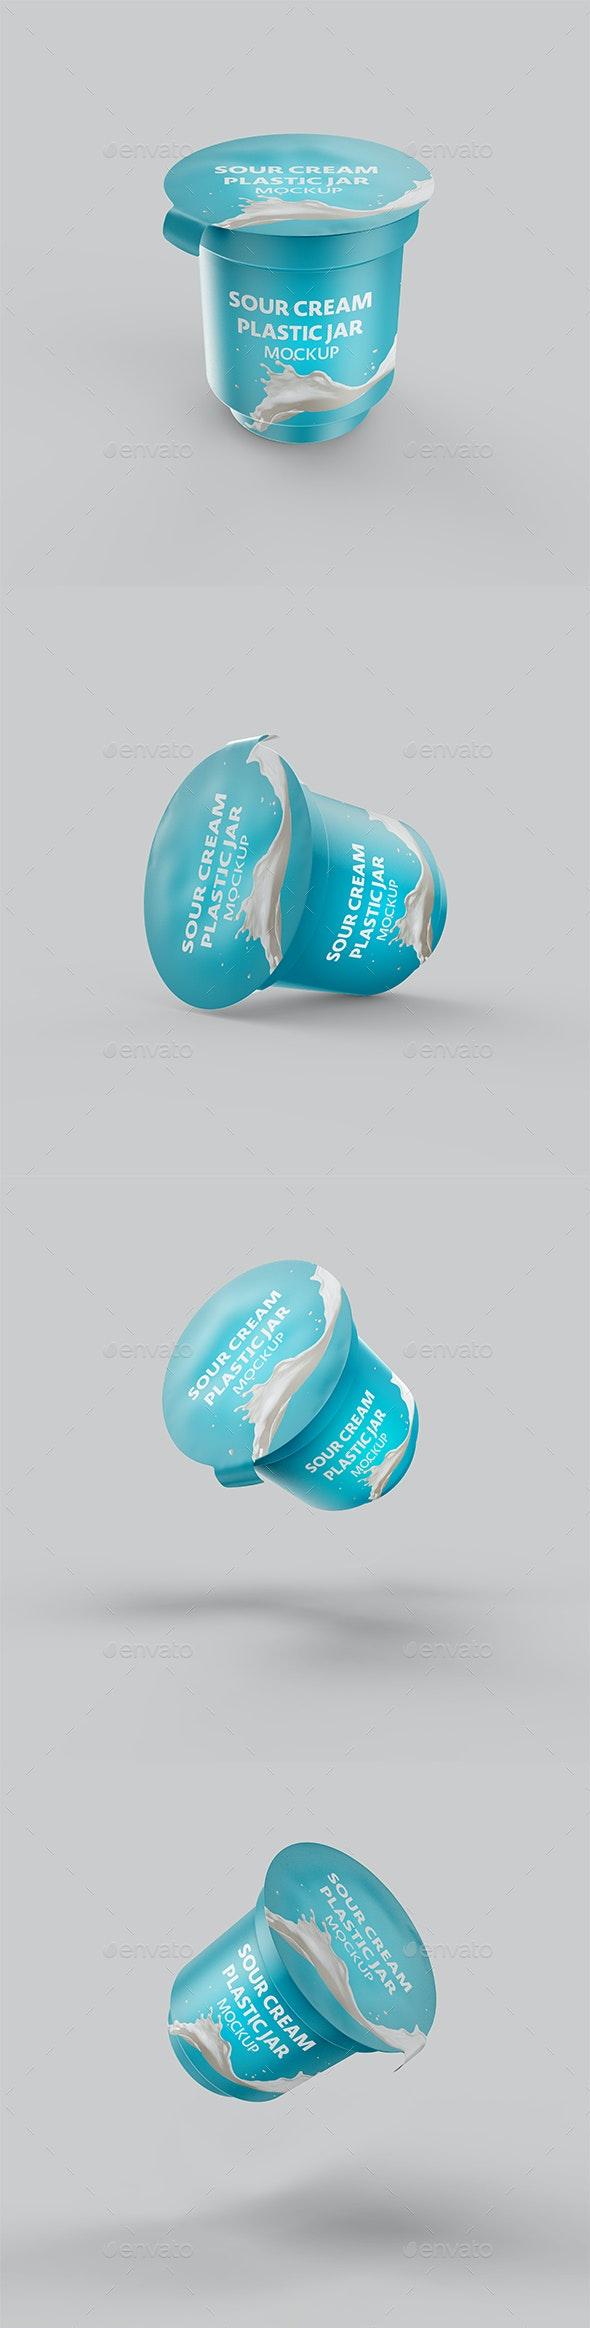 Sour Cream Plastic Big Jar Mockup - Food and Drink Packaging